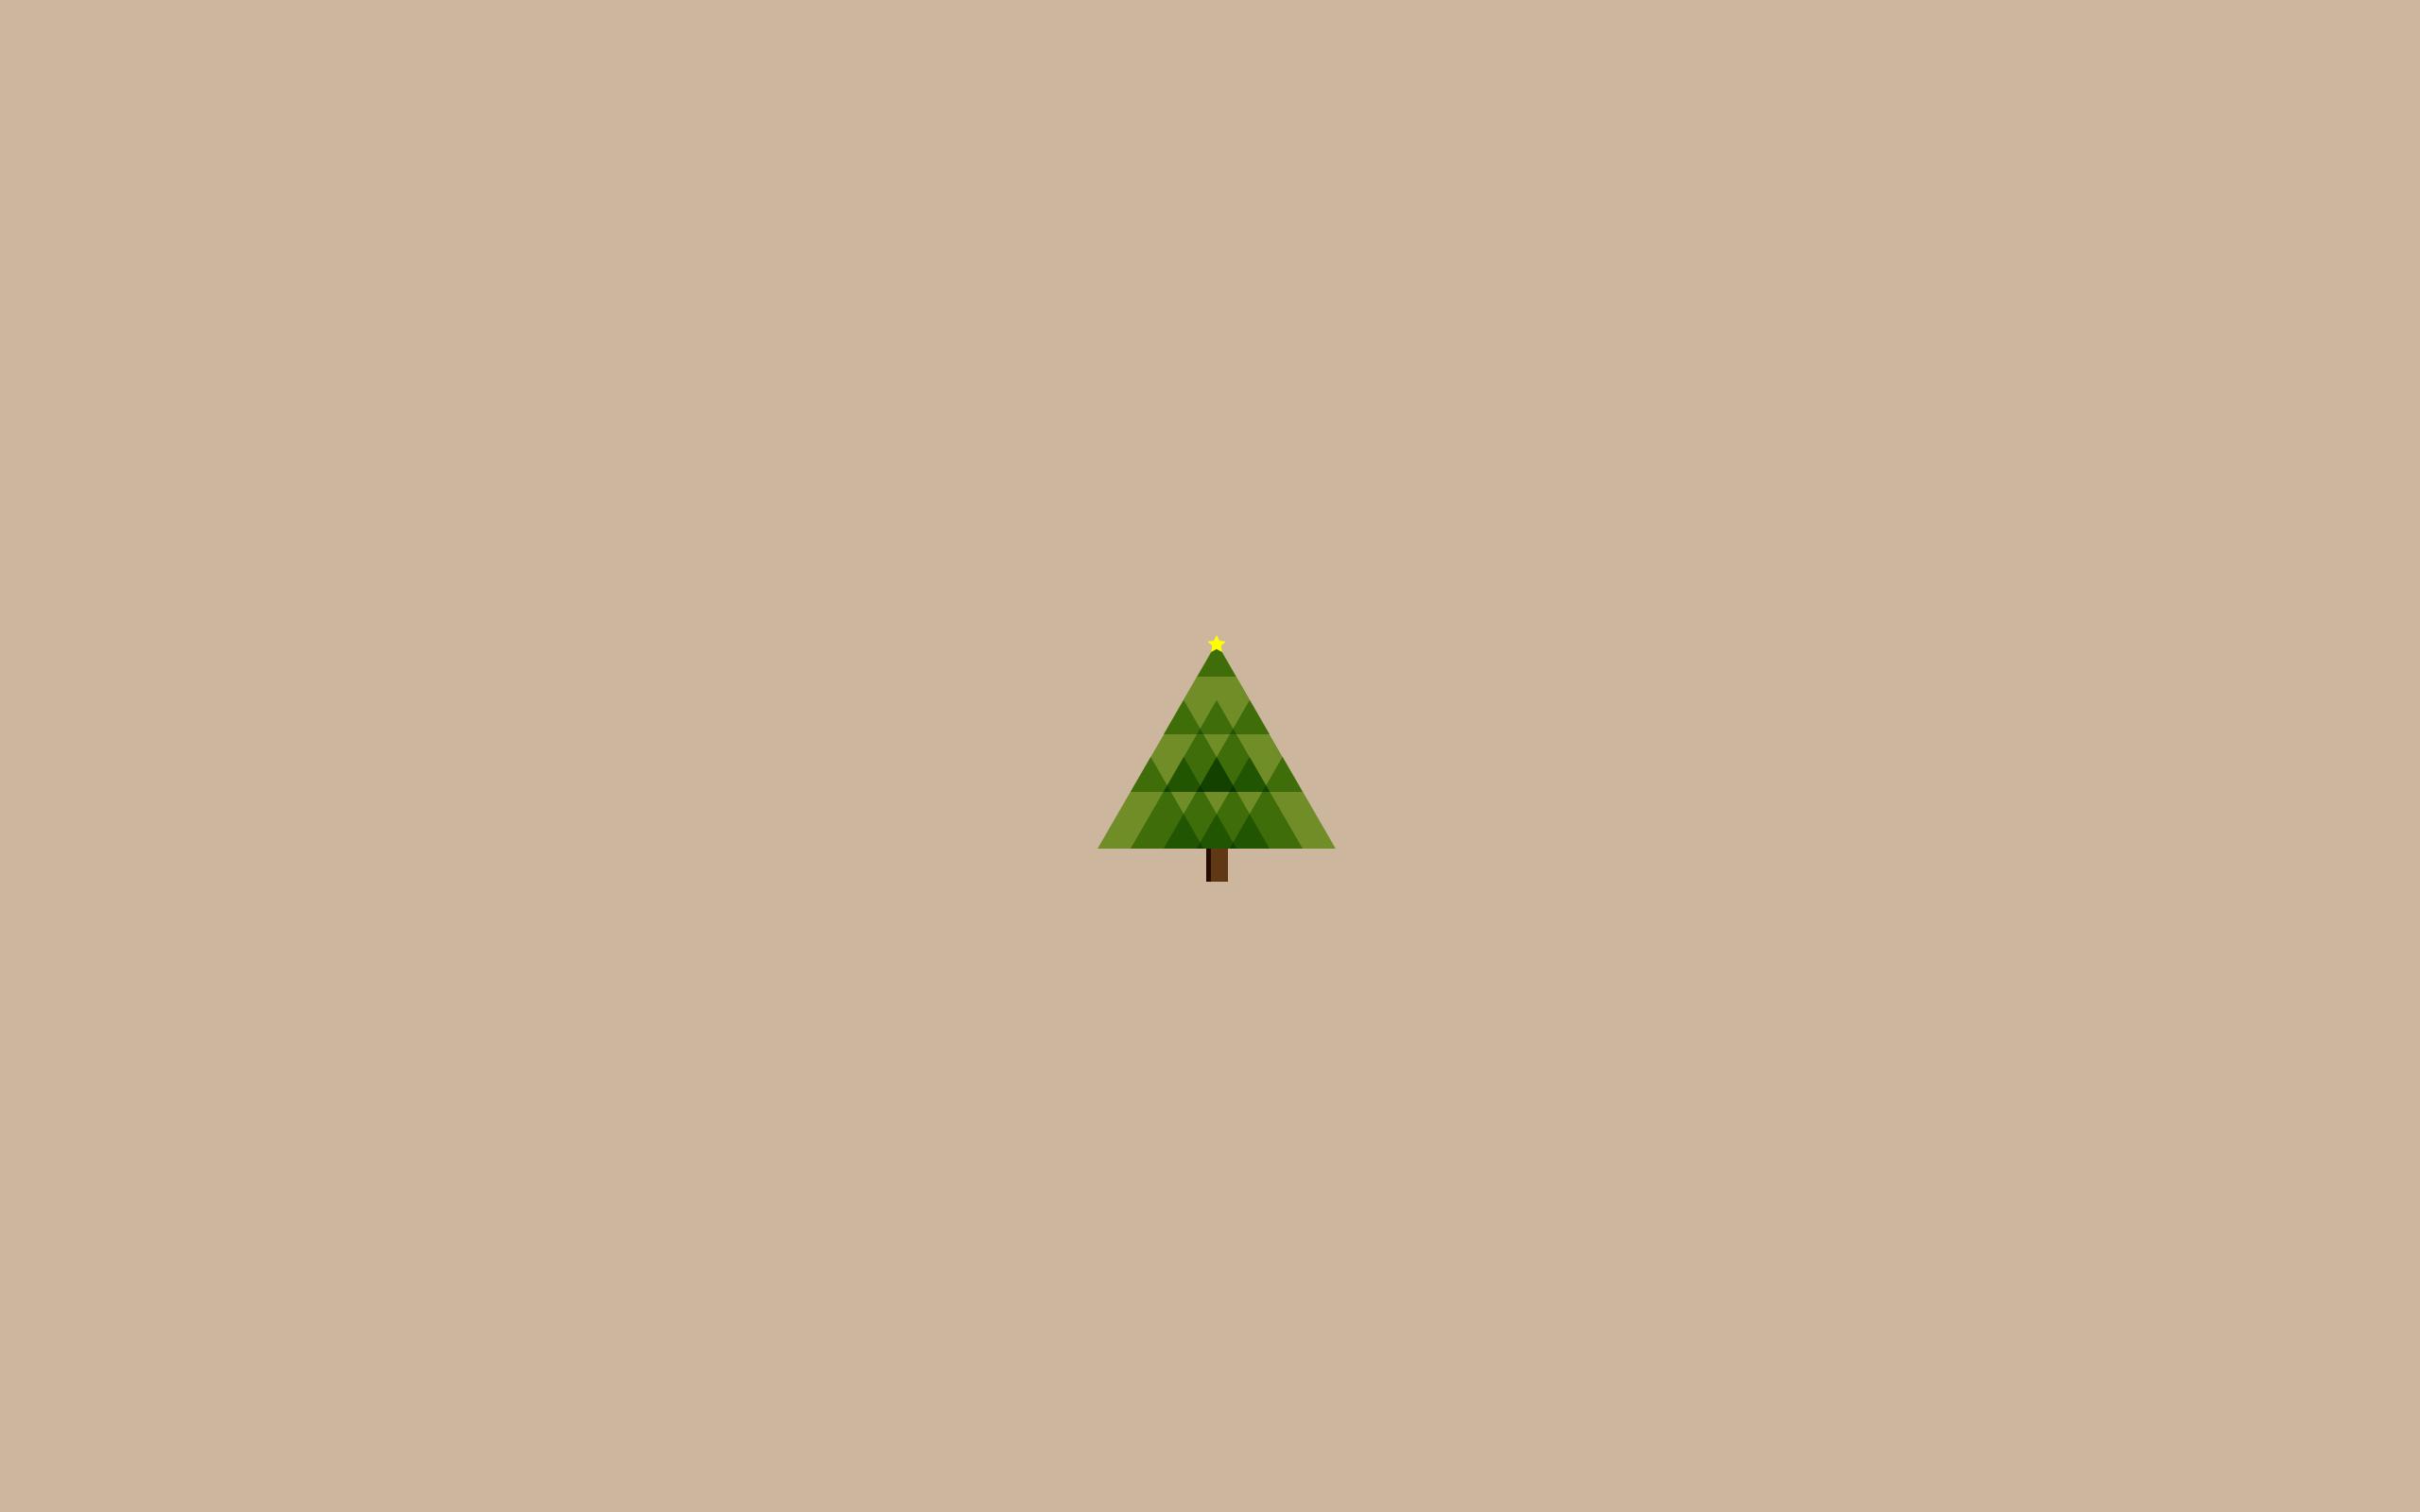 Minimal Christmas Wallpapers - Wallpaper Cave